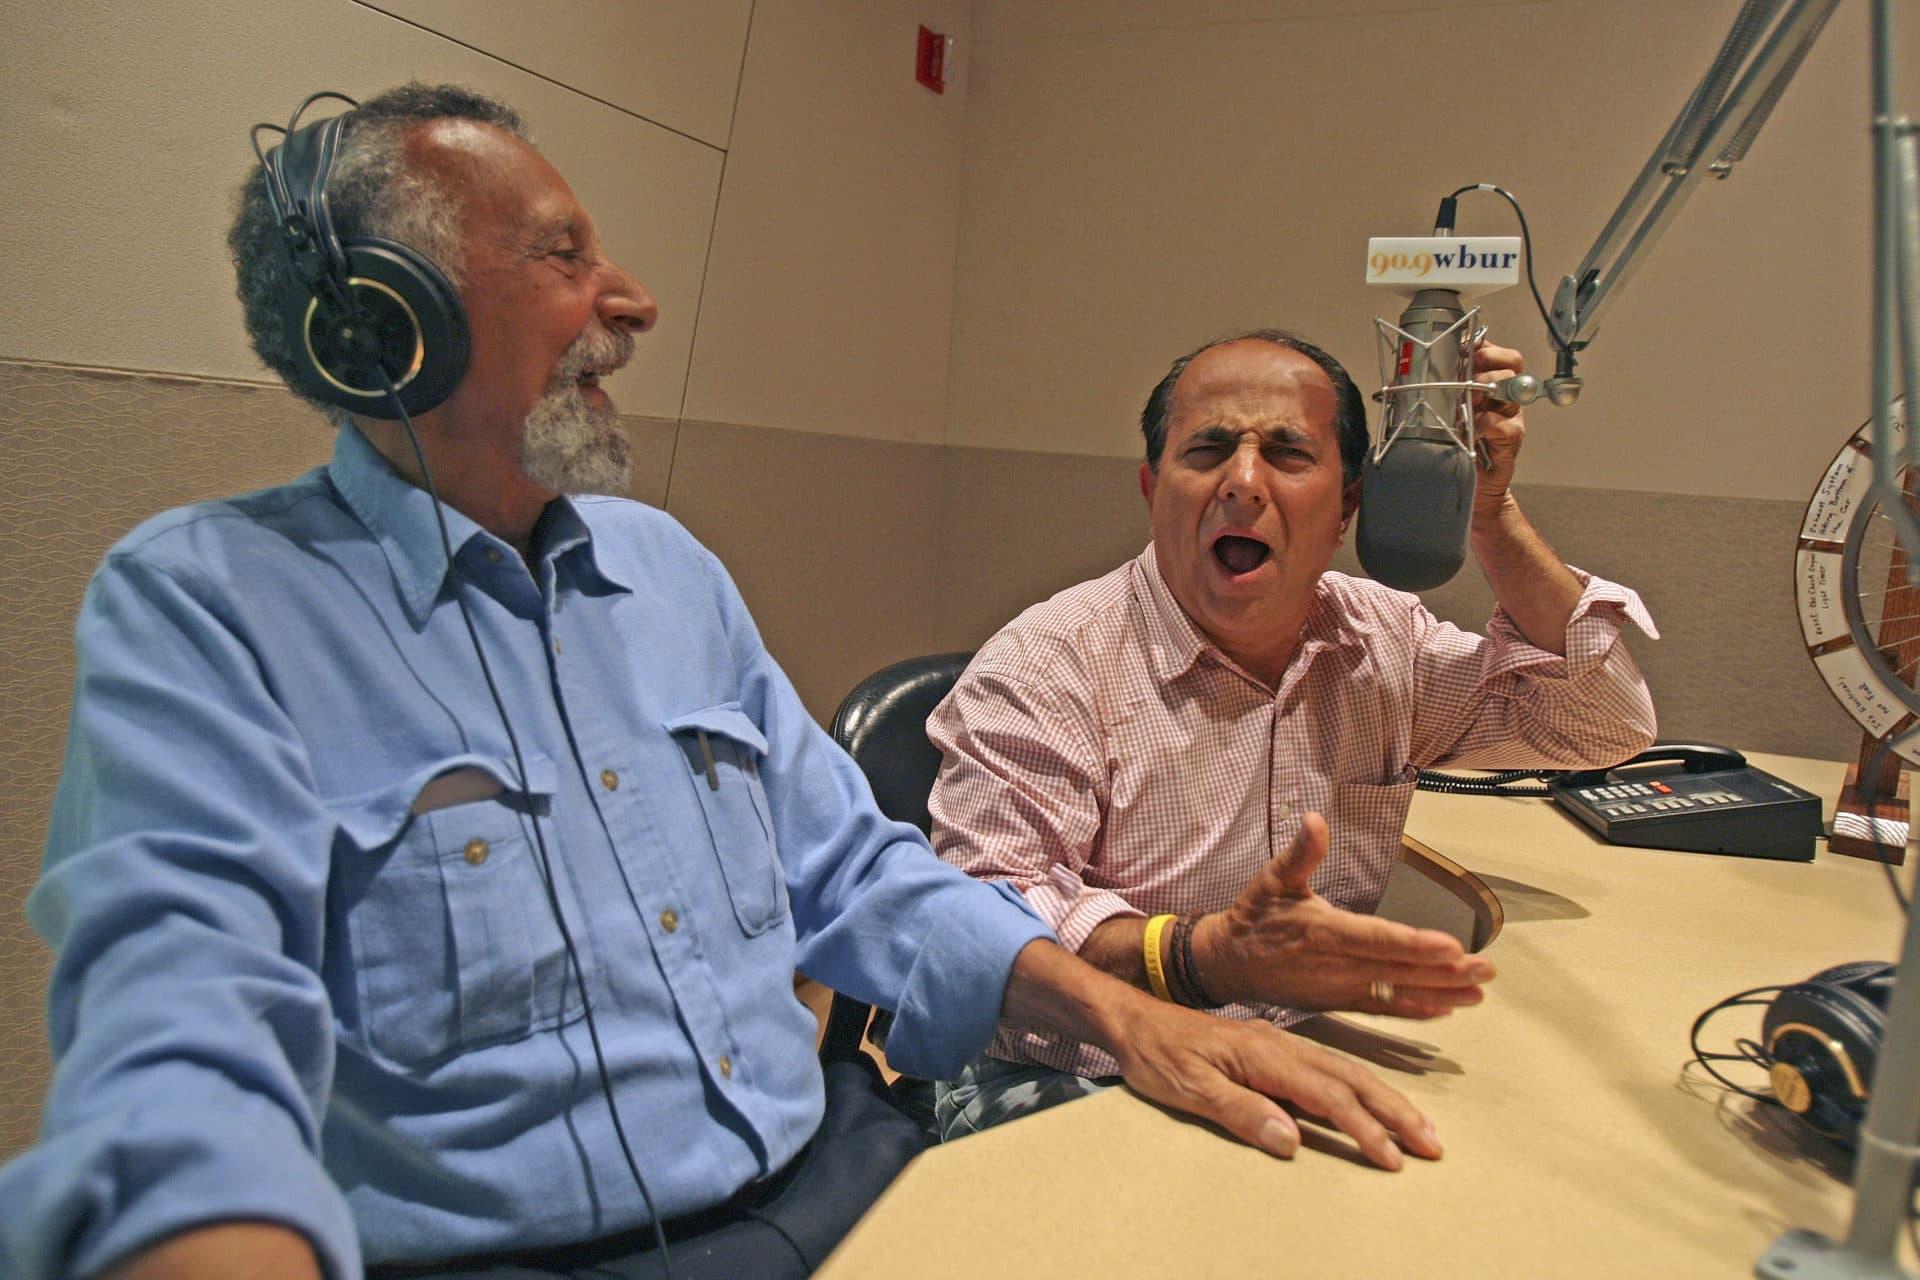 Tom and Ray Magliozzi inside WBUR's studios. (Suzanne Kreiter/The Boston Globe via Getty Images)